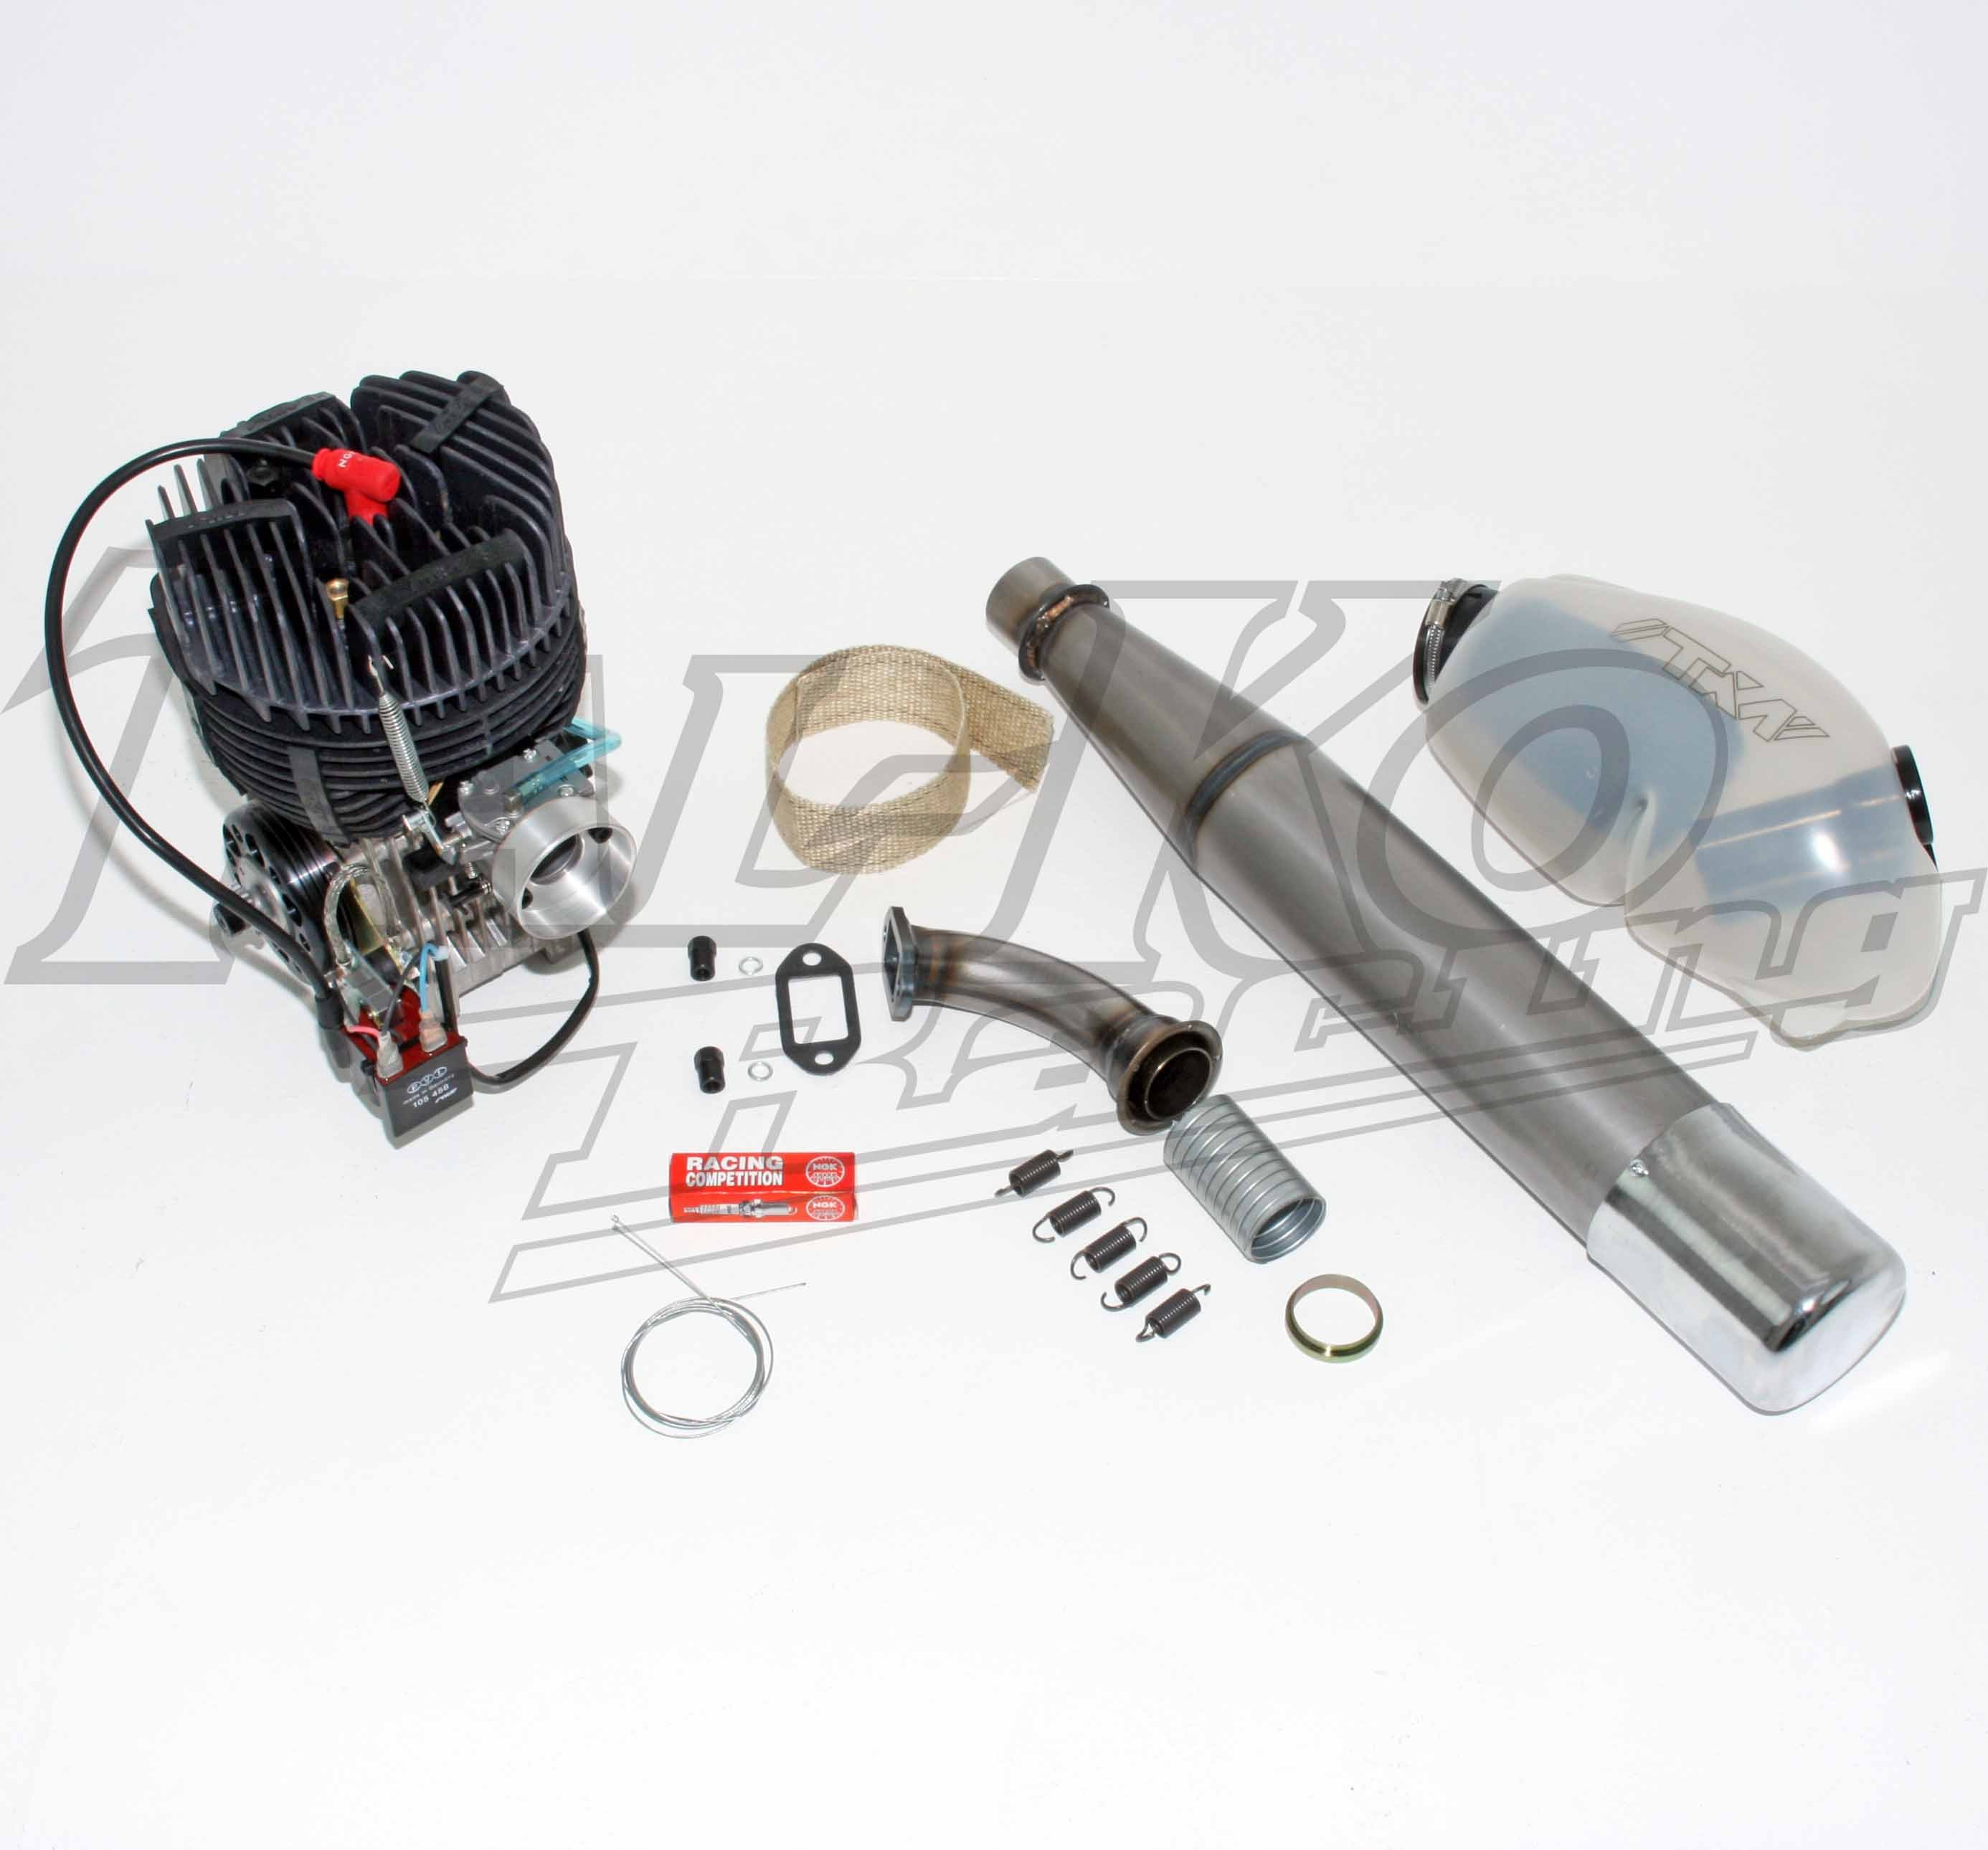 TKM BT82 100cc JUNIOR ENGINE V CLUTCH DRIVE